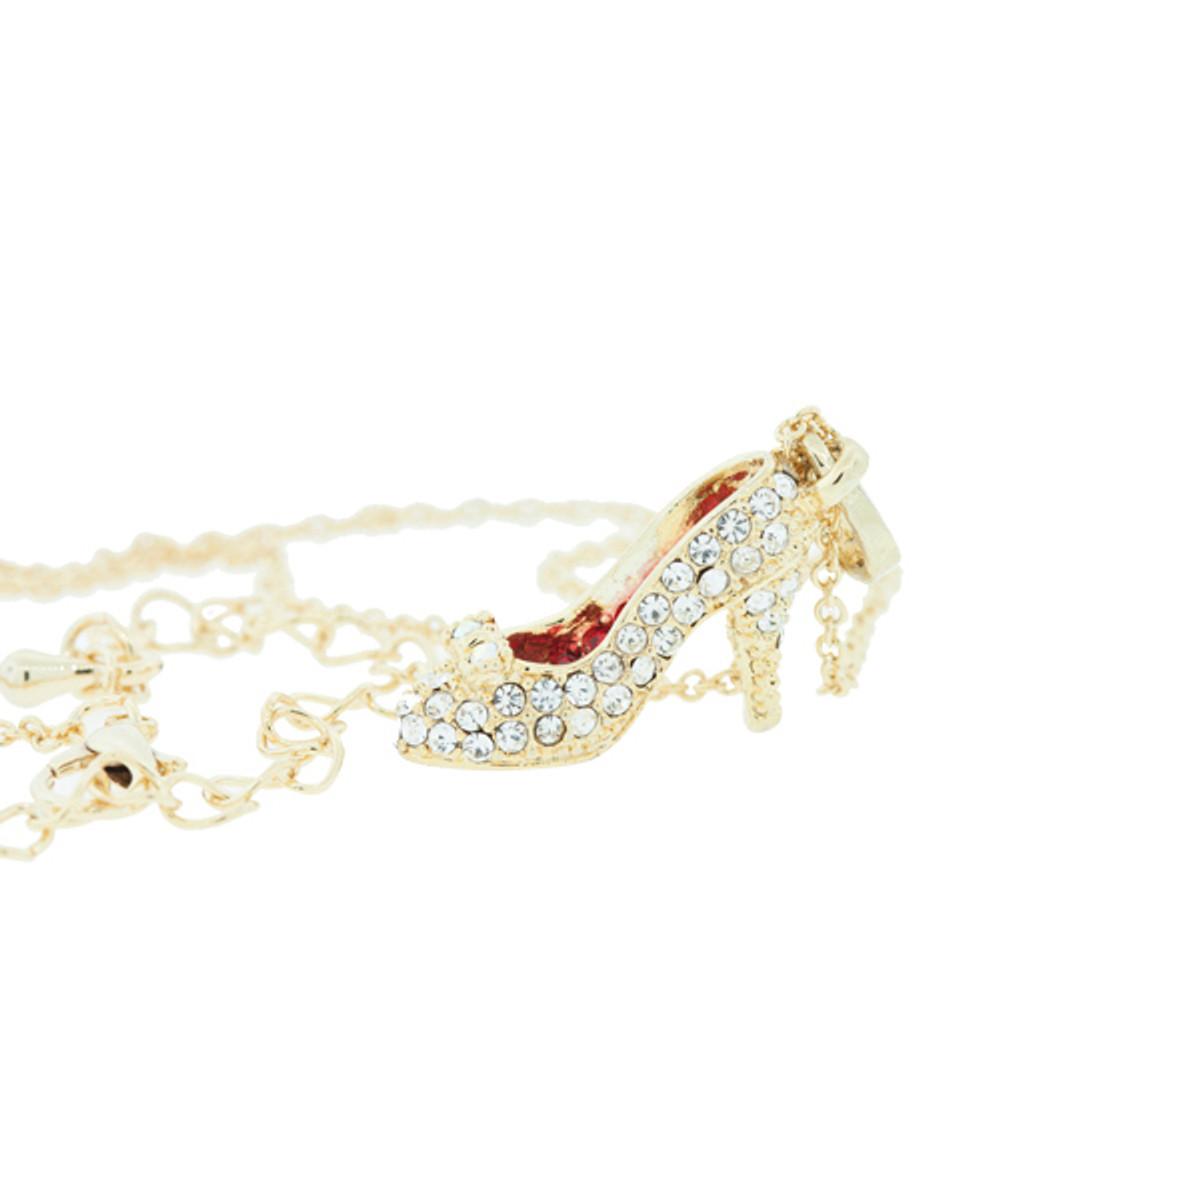 Hamilton Crawford Dorothy Shoe Necklace Gold Necklace